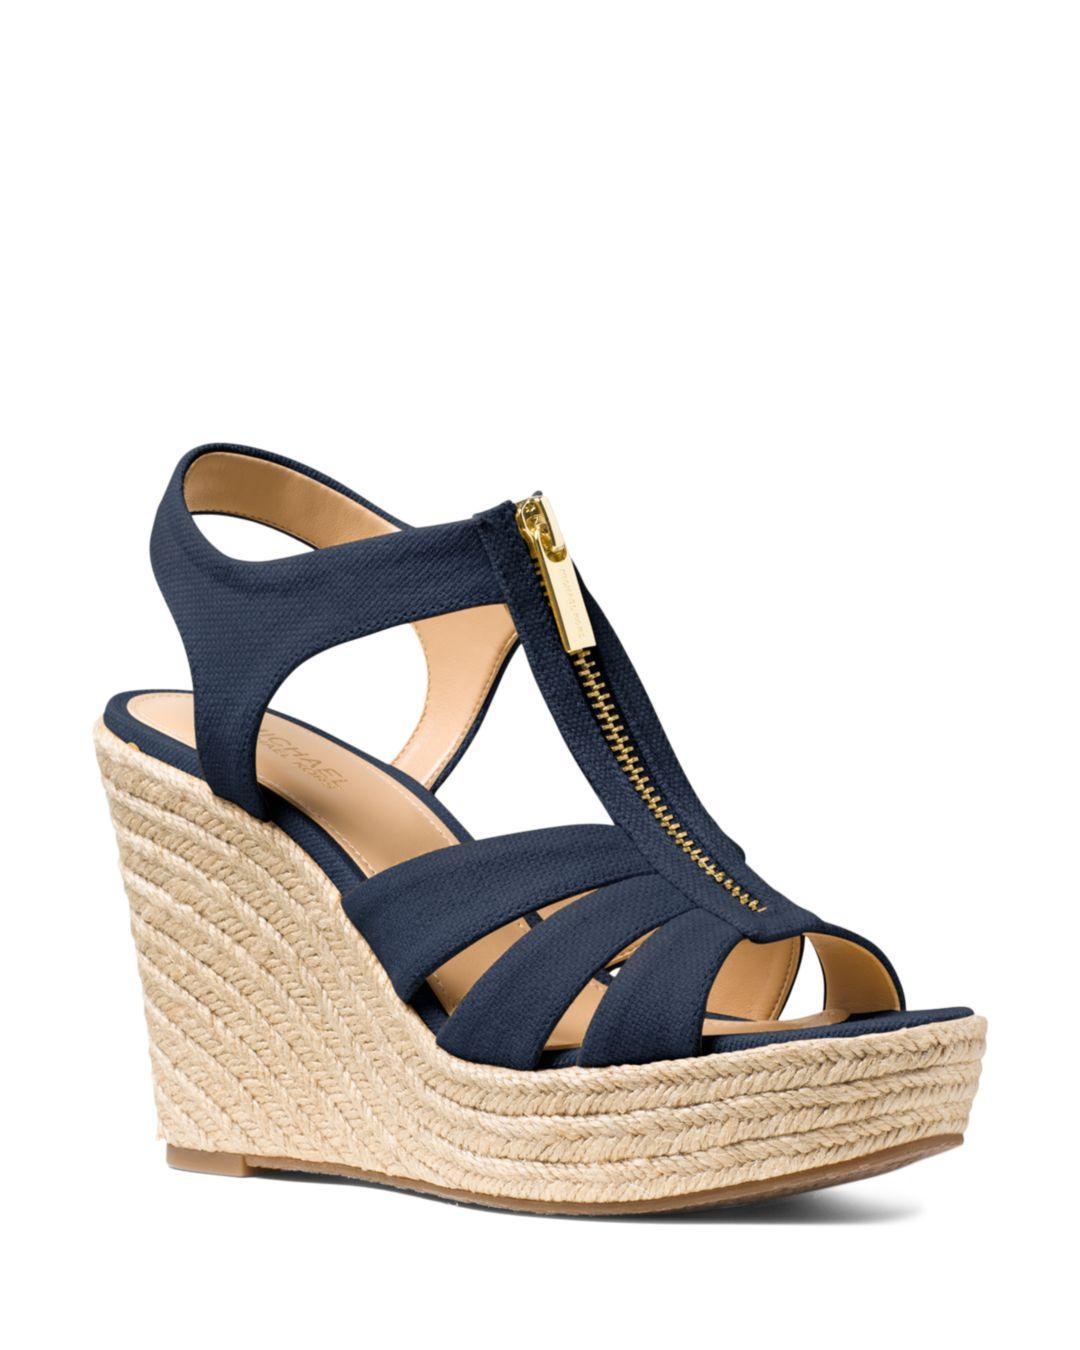 1d5387c65f3b MICHAEL Michael Kors. Blue Women s Berkley Woven Espadrille Wedge Sandals